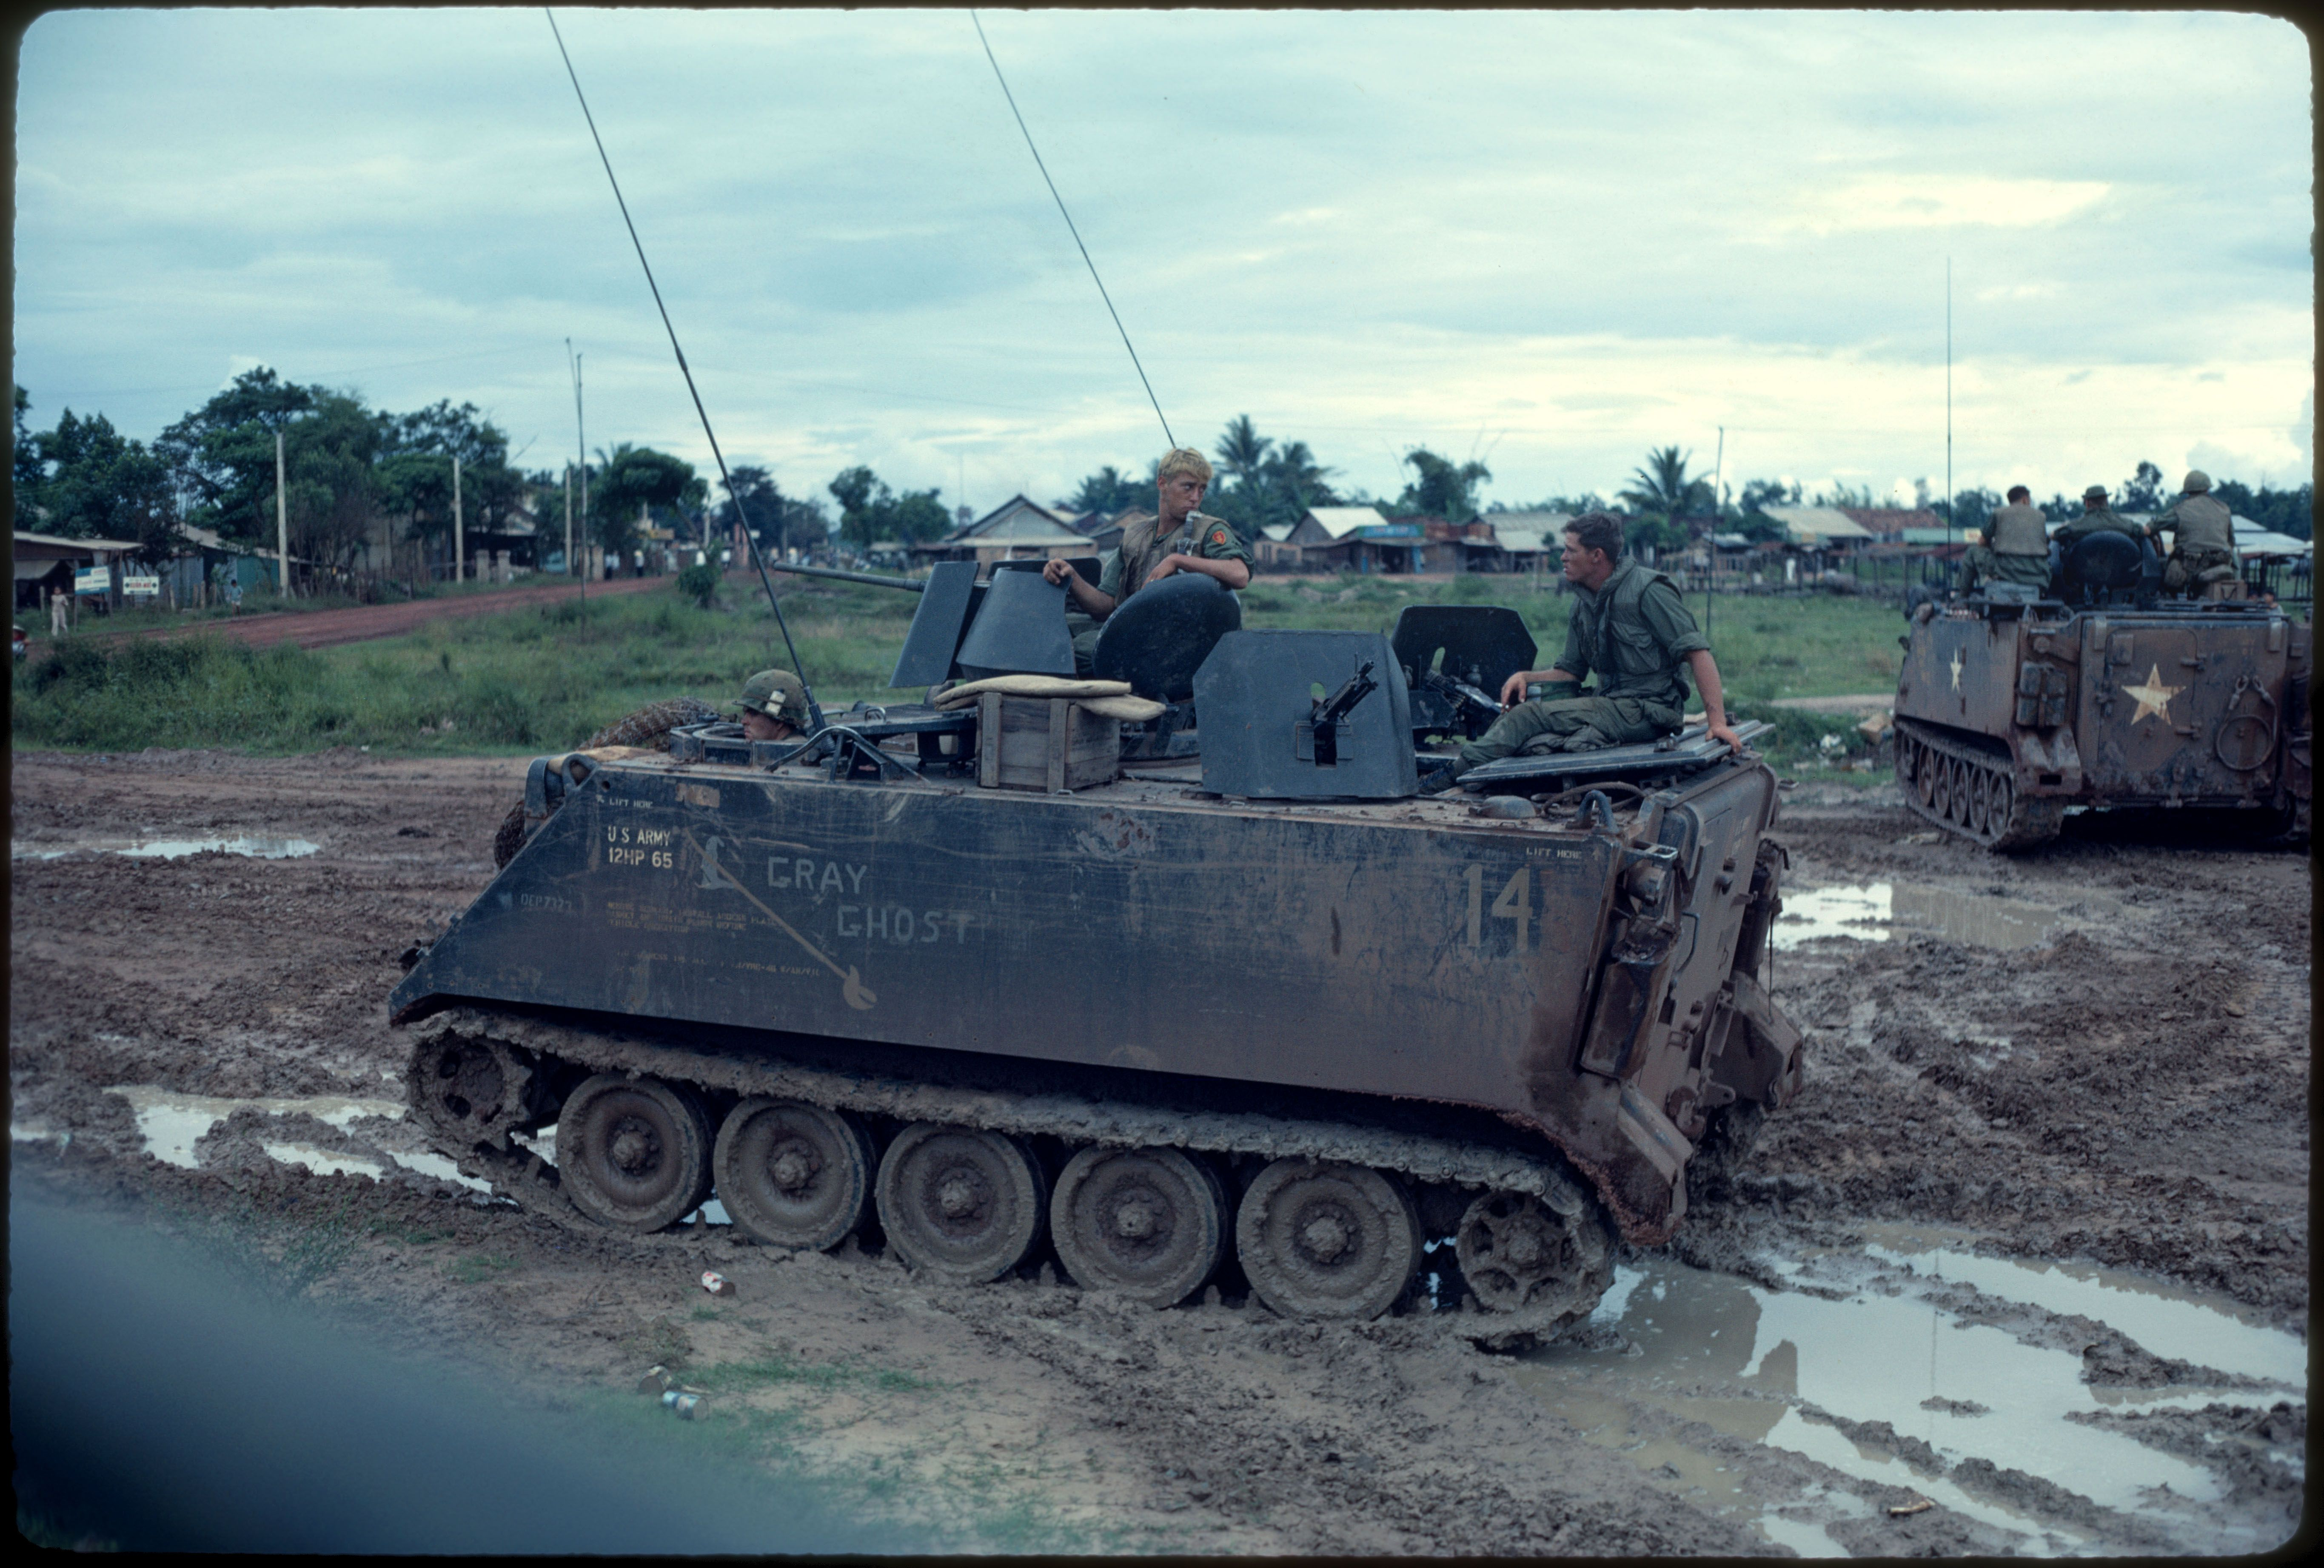 U S Army M113 Apc Gray Ghost 1969 Vietnam War Kodachrome